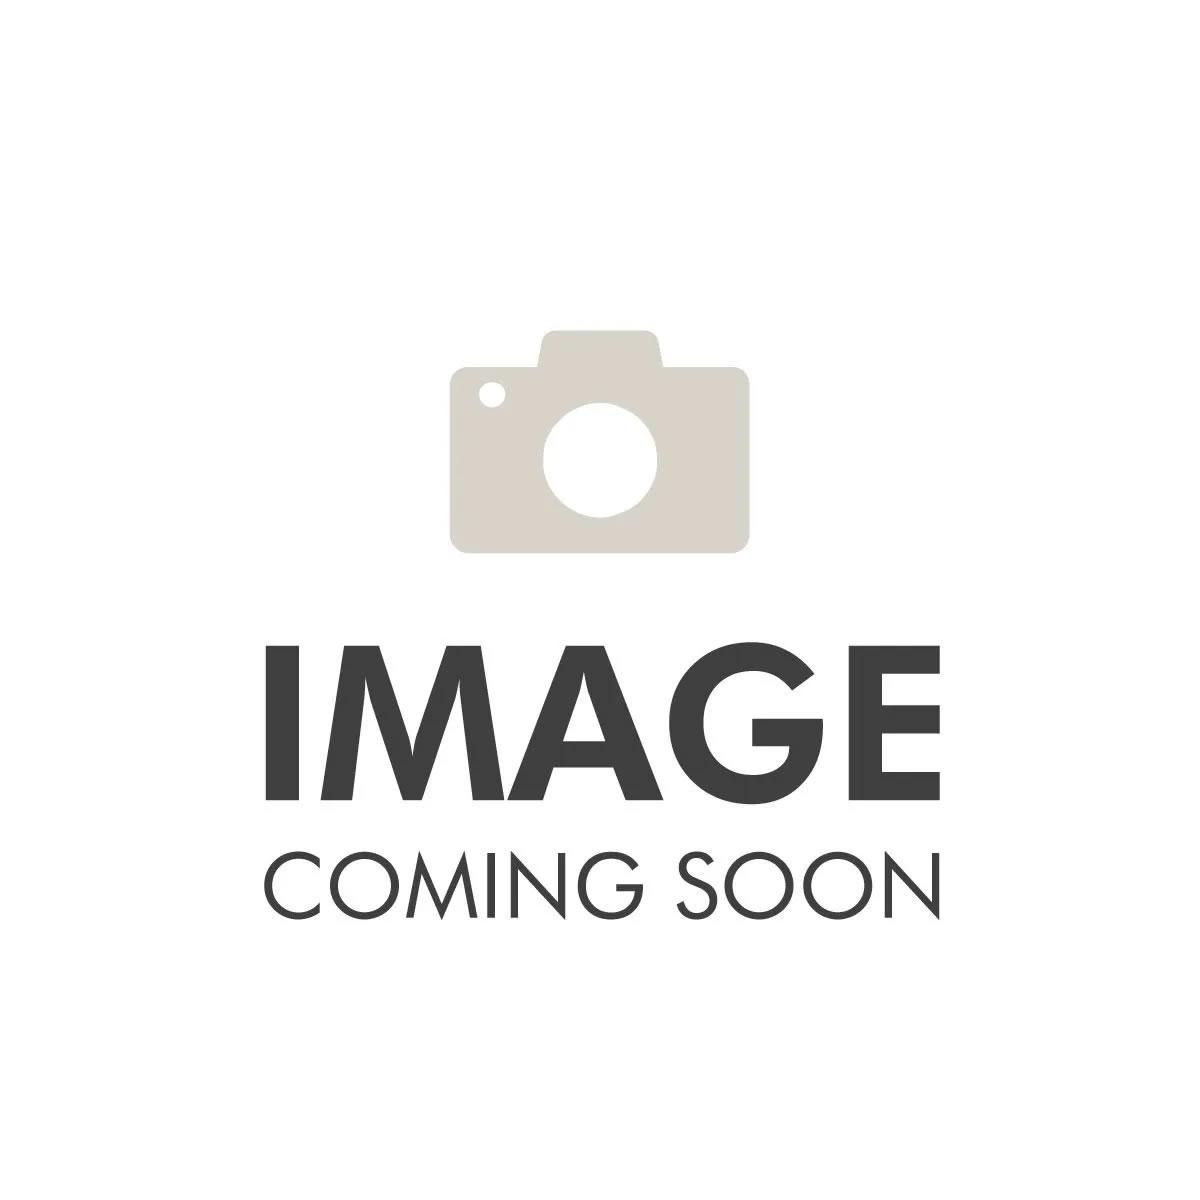 87 Jeep Solenoid Wiring Wiring Diagrams